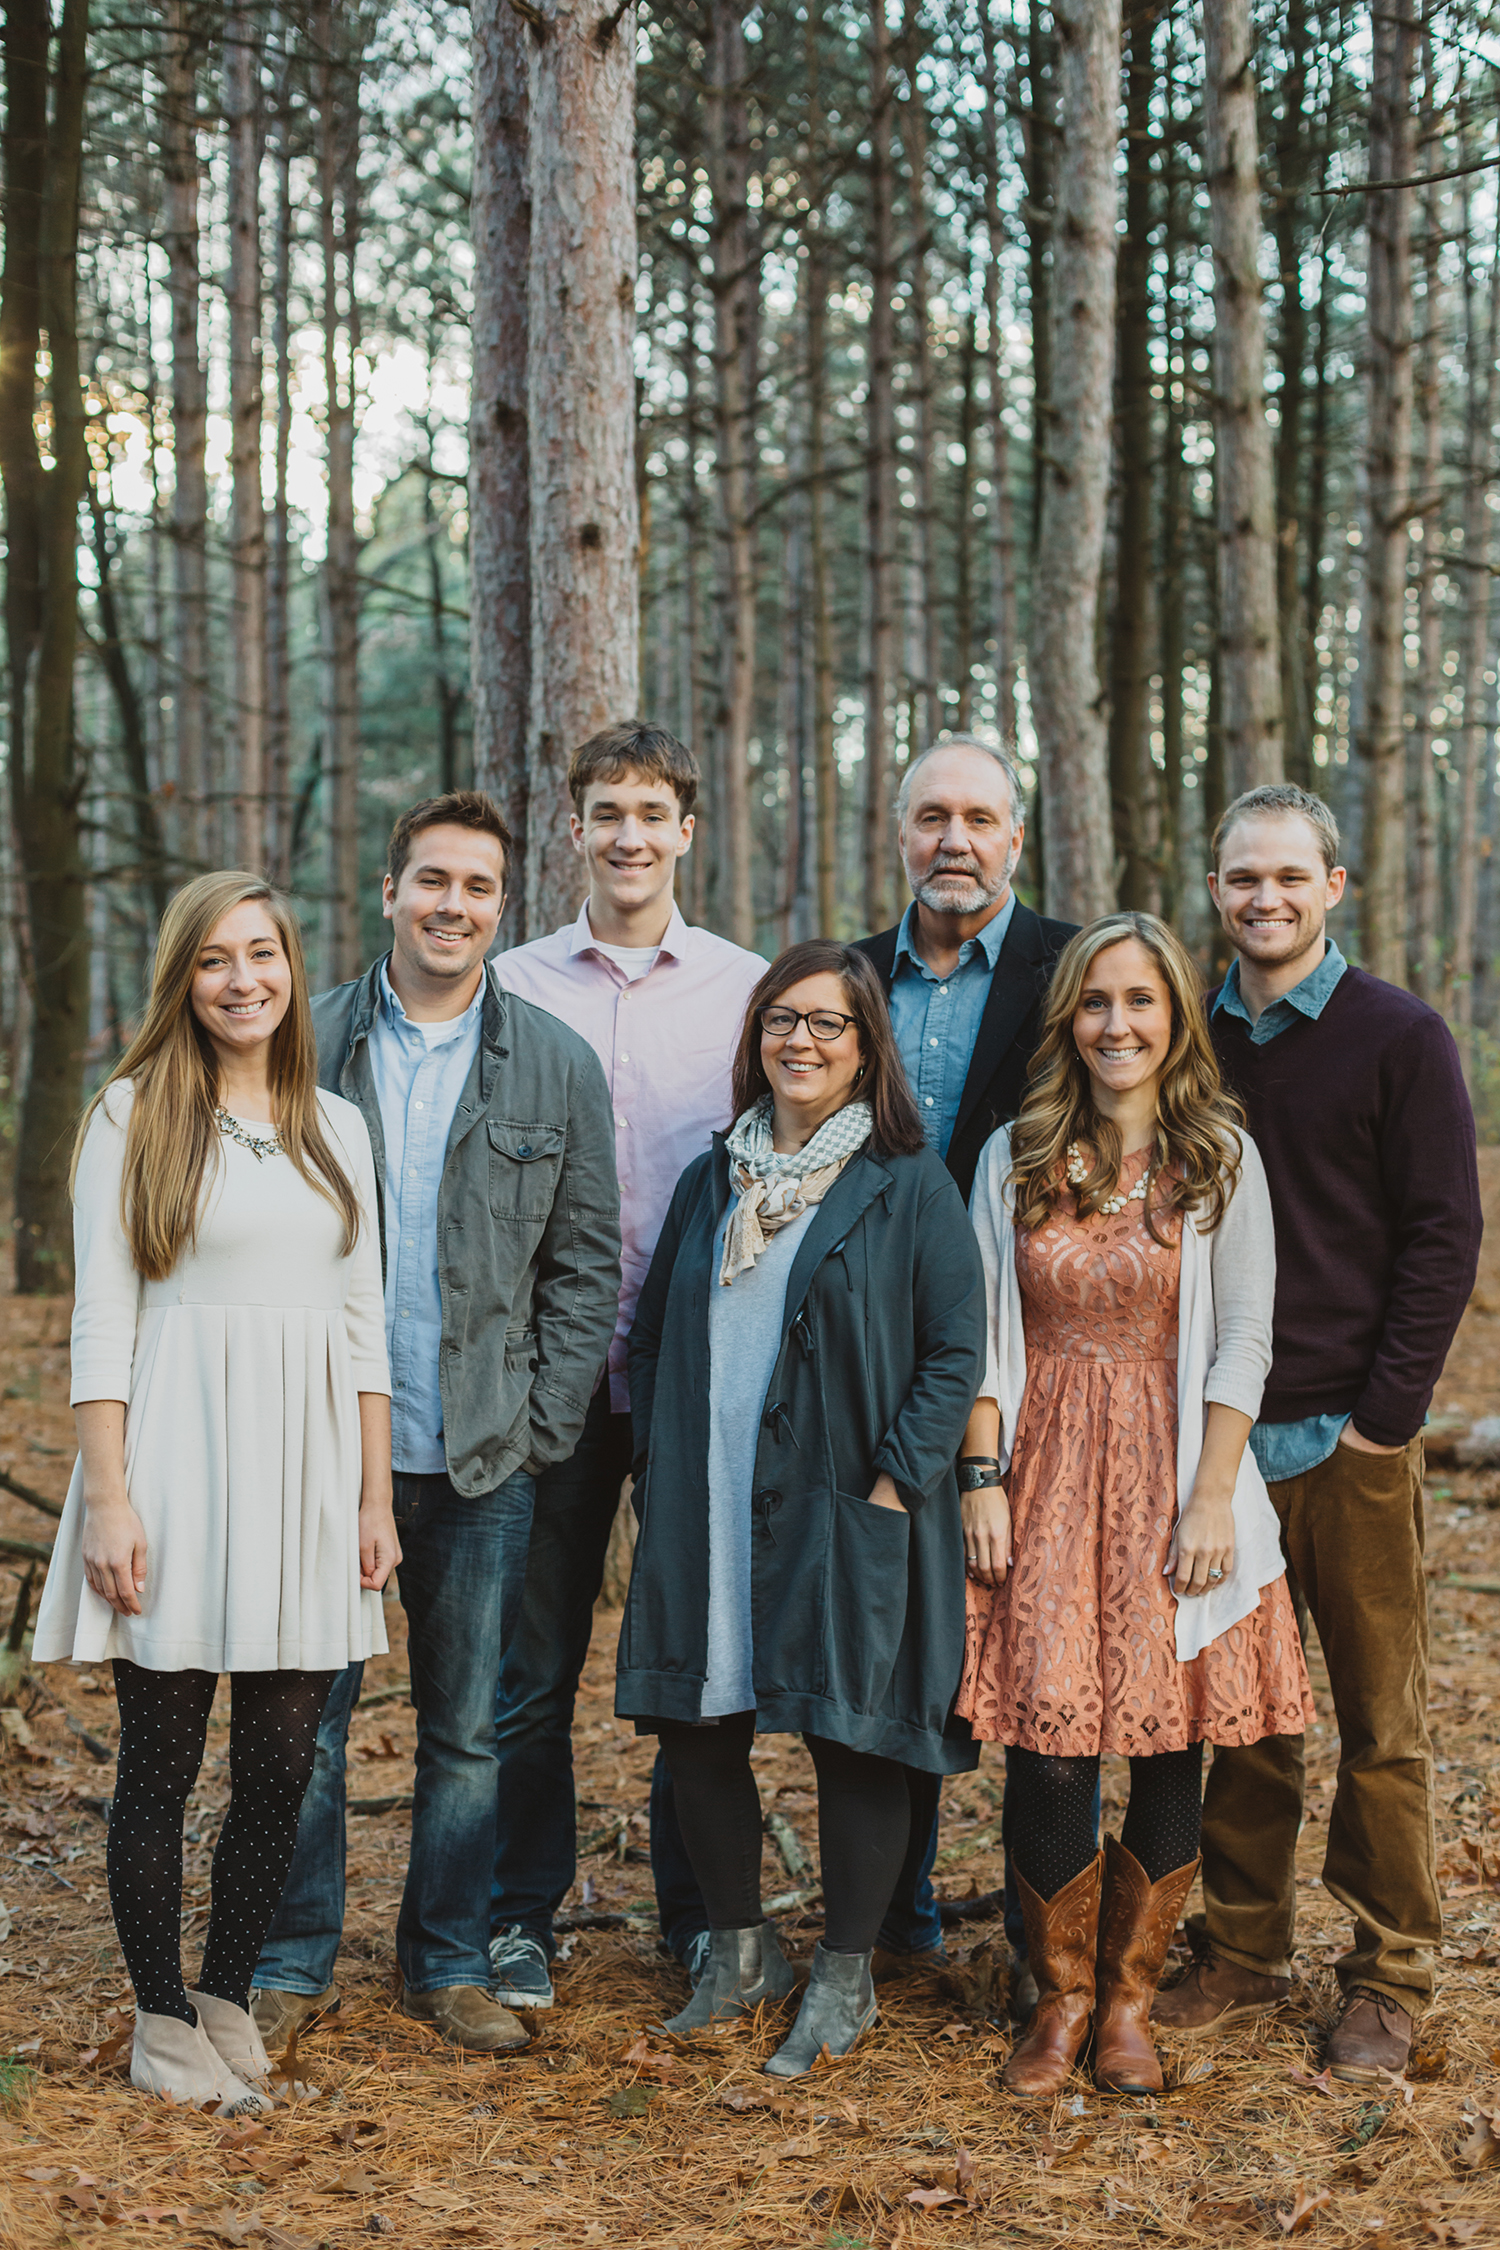 Jillian VanZytveld Photography Grand Rapids Family Portraits_06.jpg